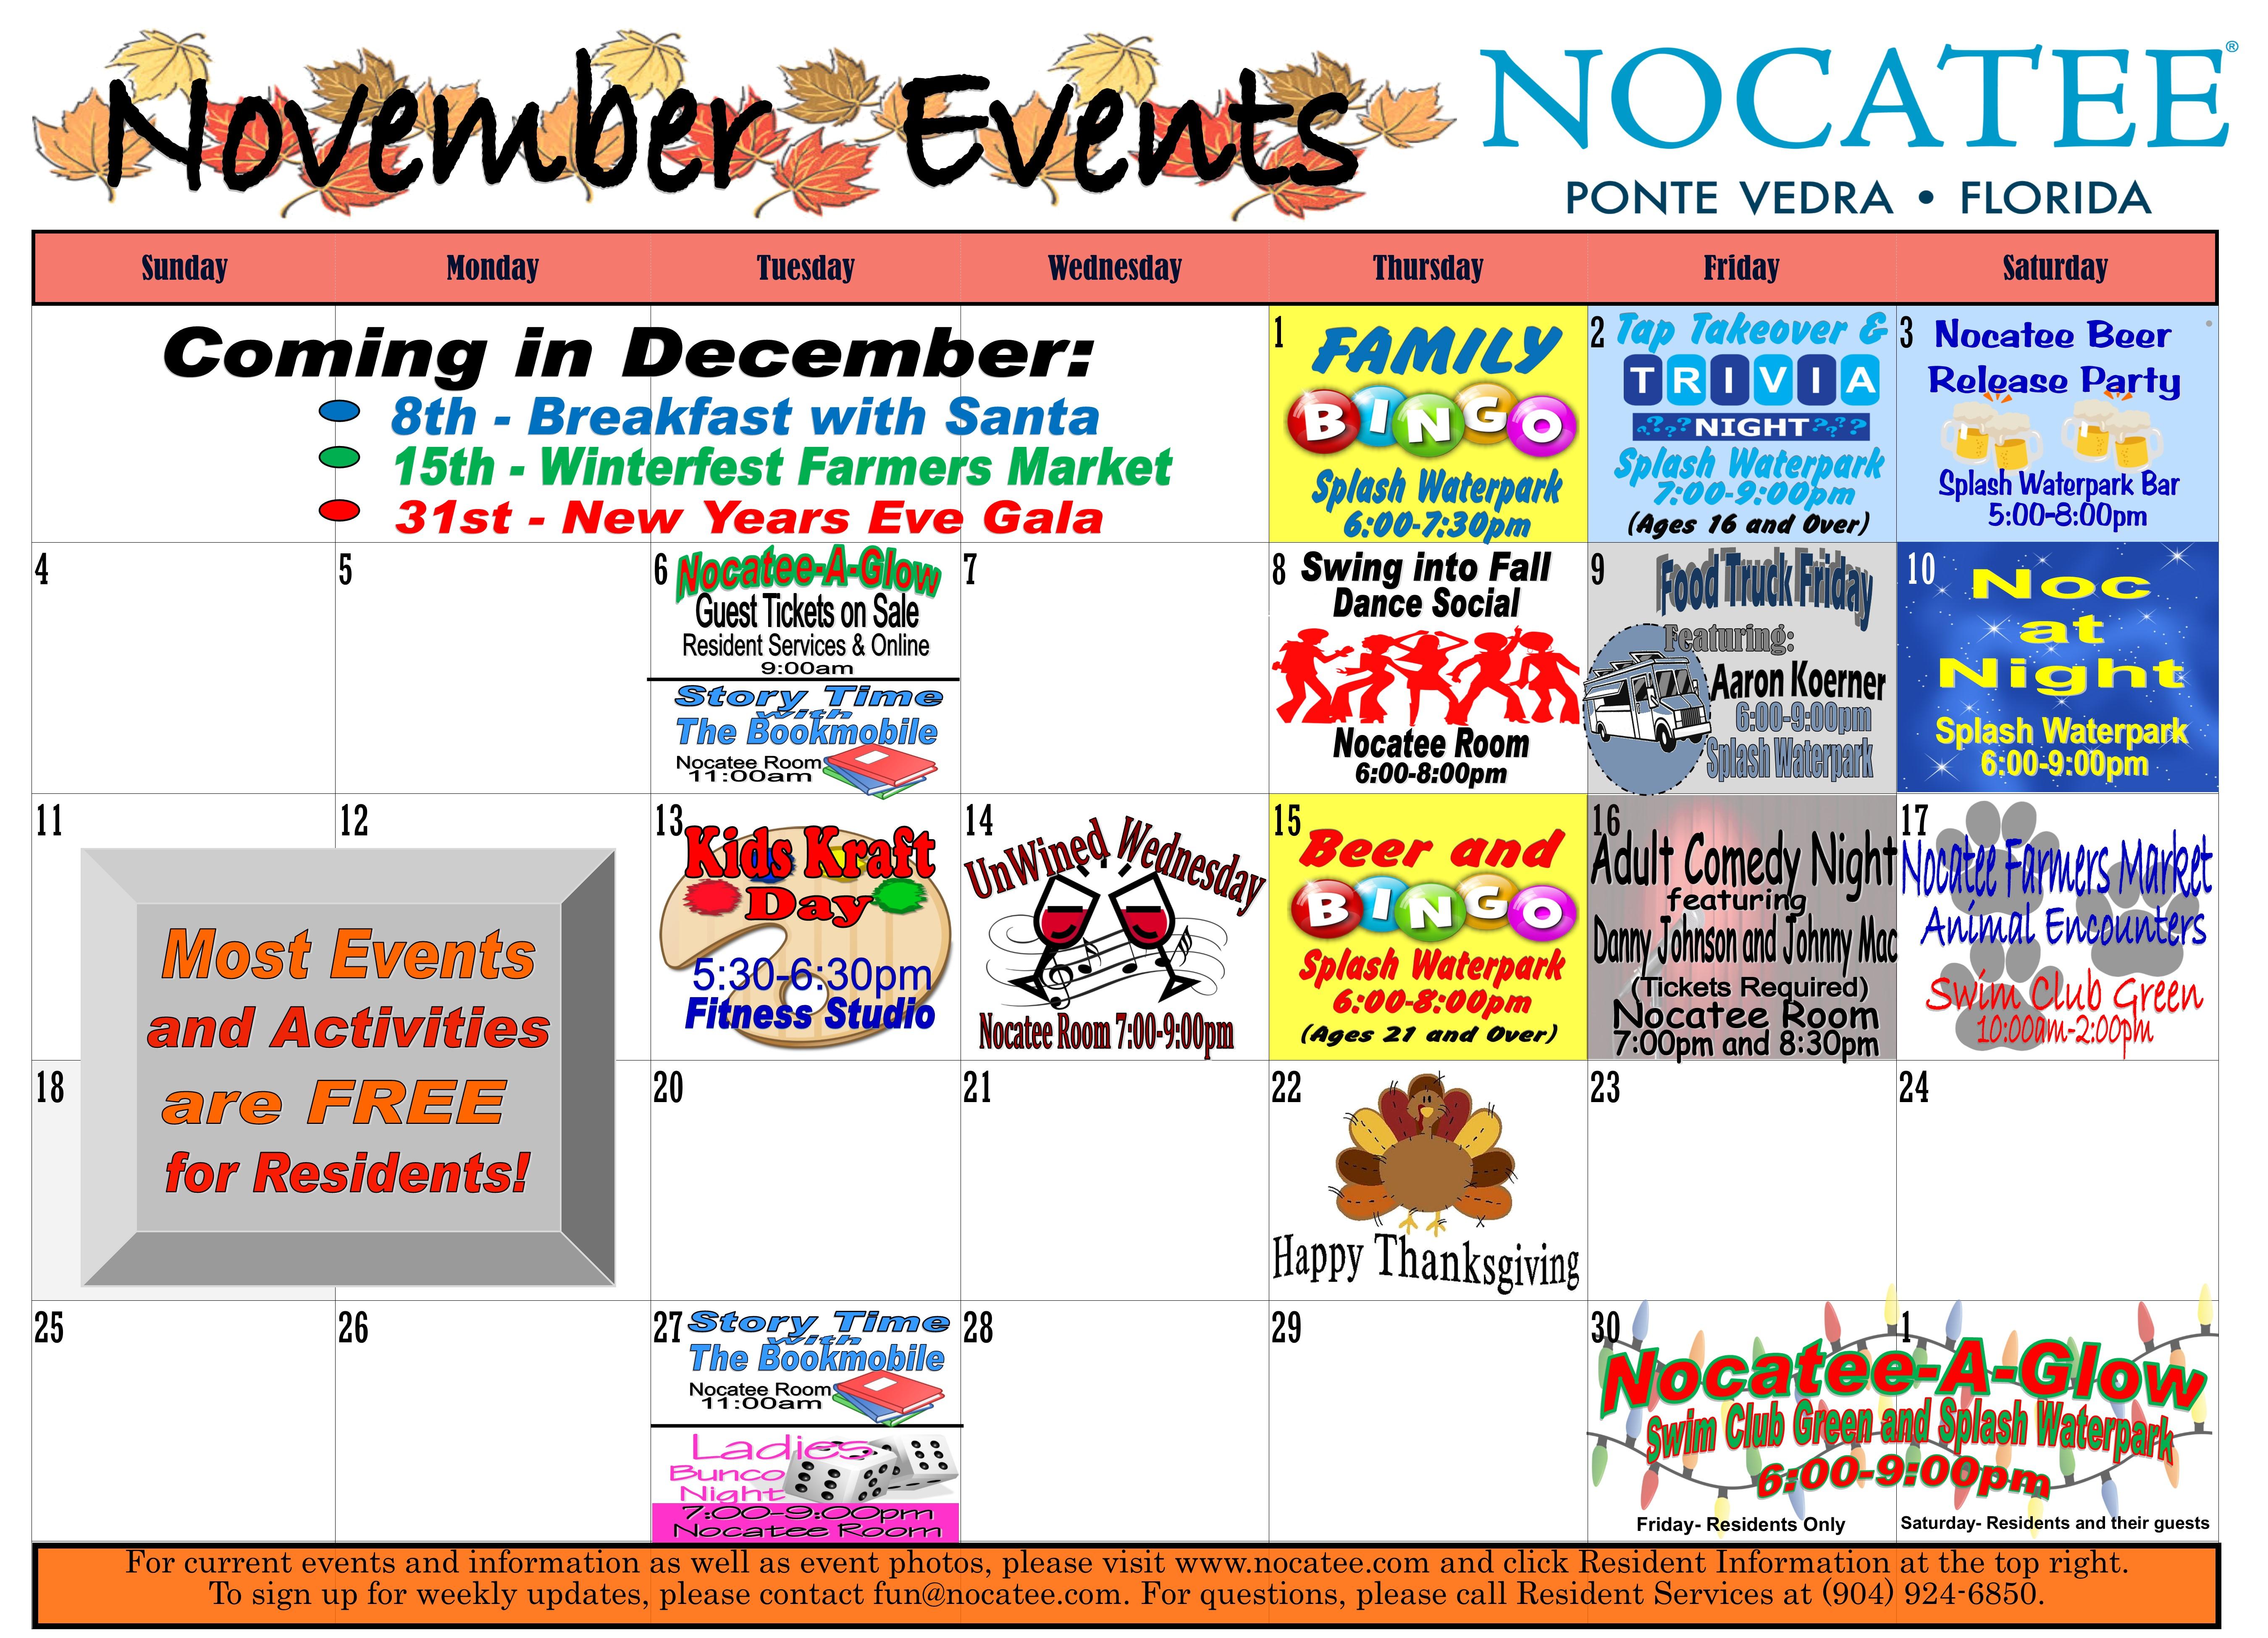 november 18 events.jpg